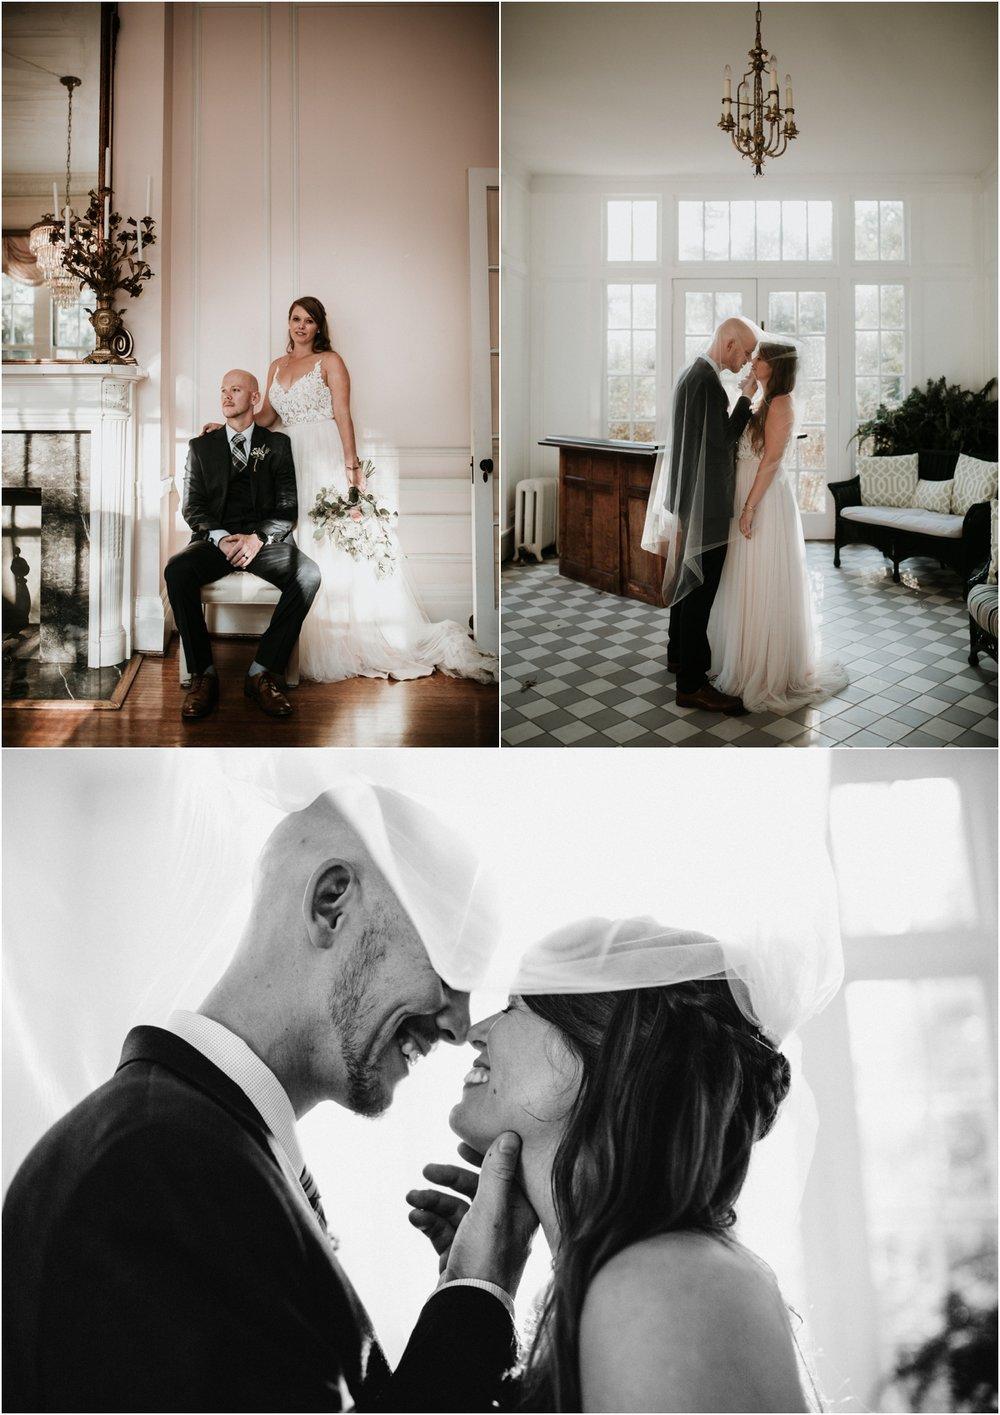 Stowe-manor-wedding-belmont-nc_0051.jpg